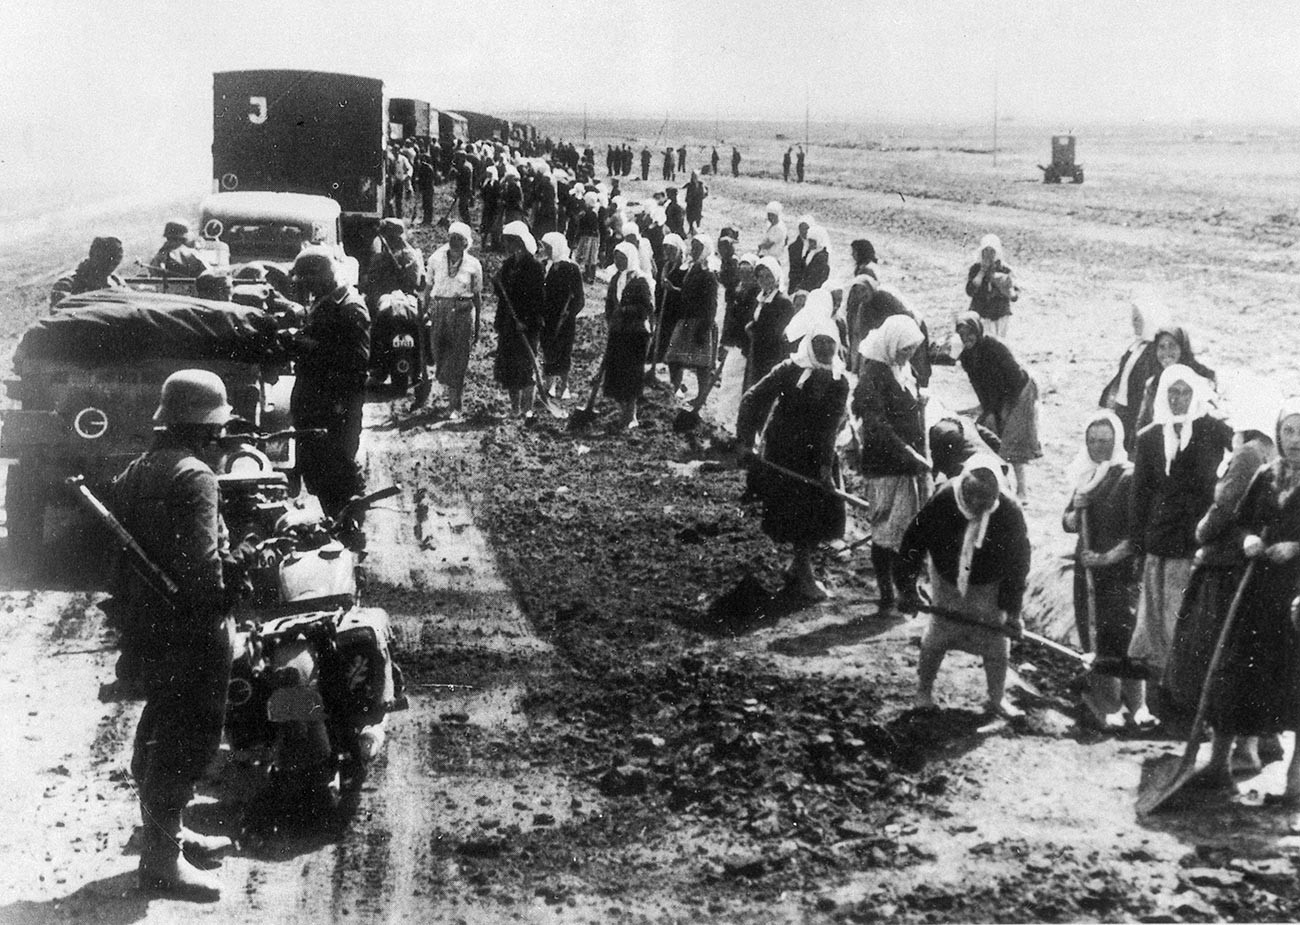 Совјетски грађани за време радова на путу под надзором немачких војника.